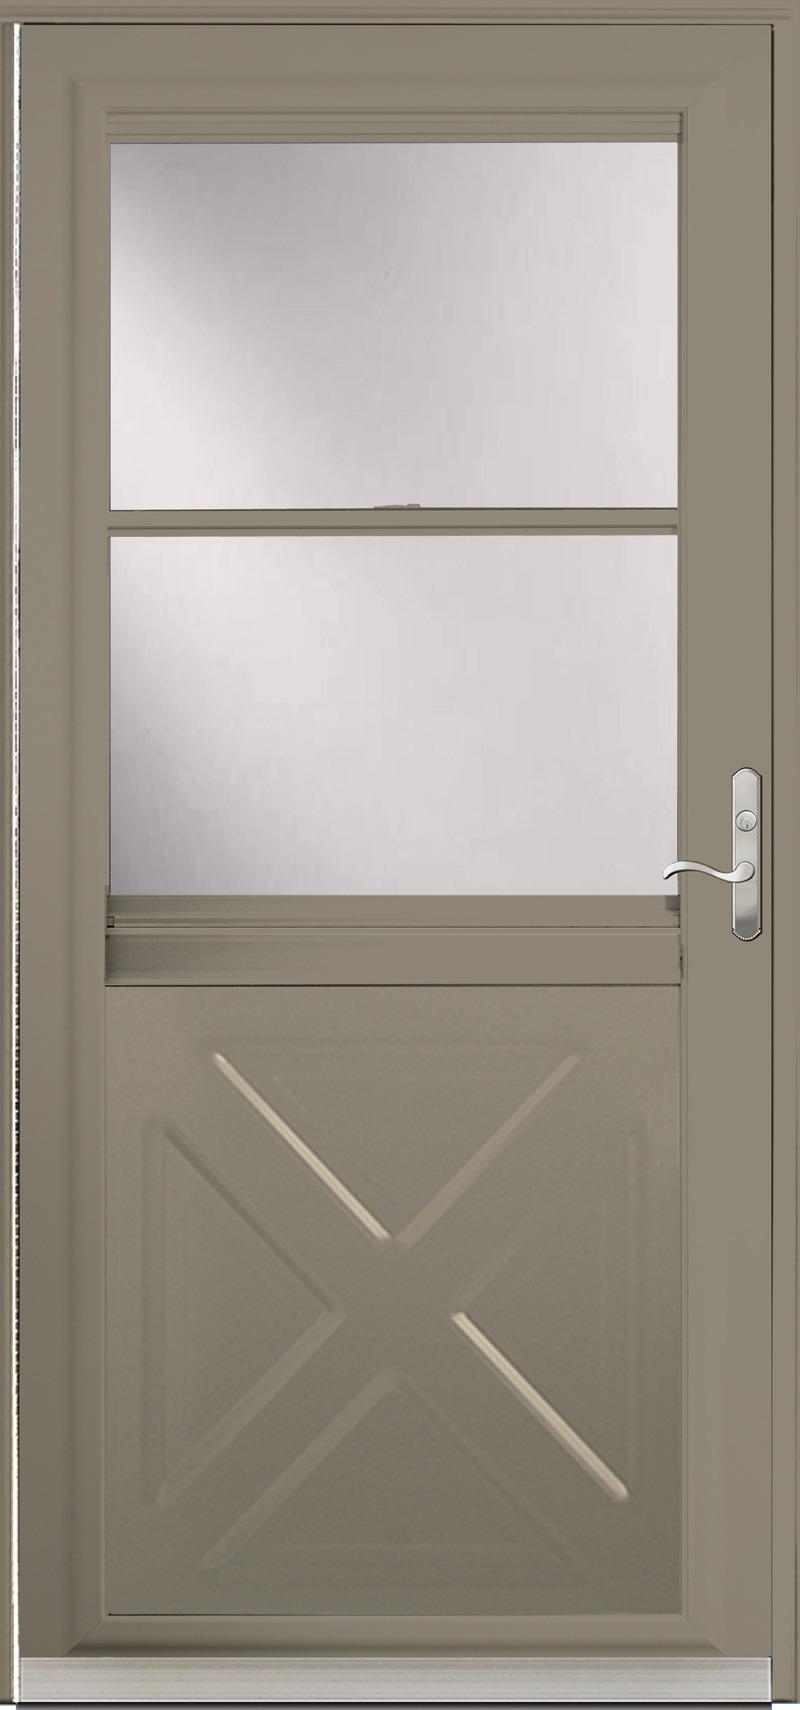 A Tan door with glass in the upper half